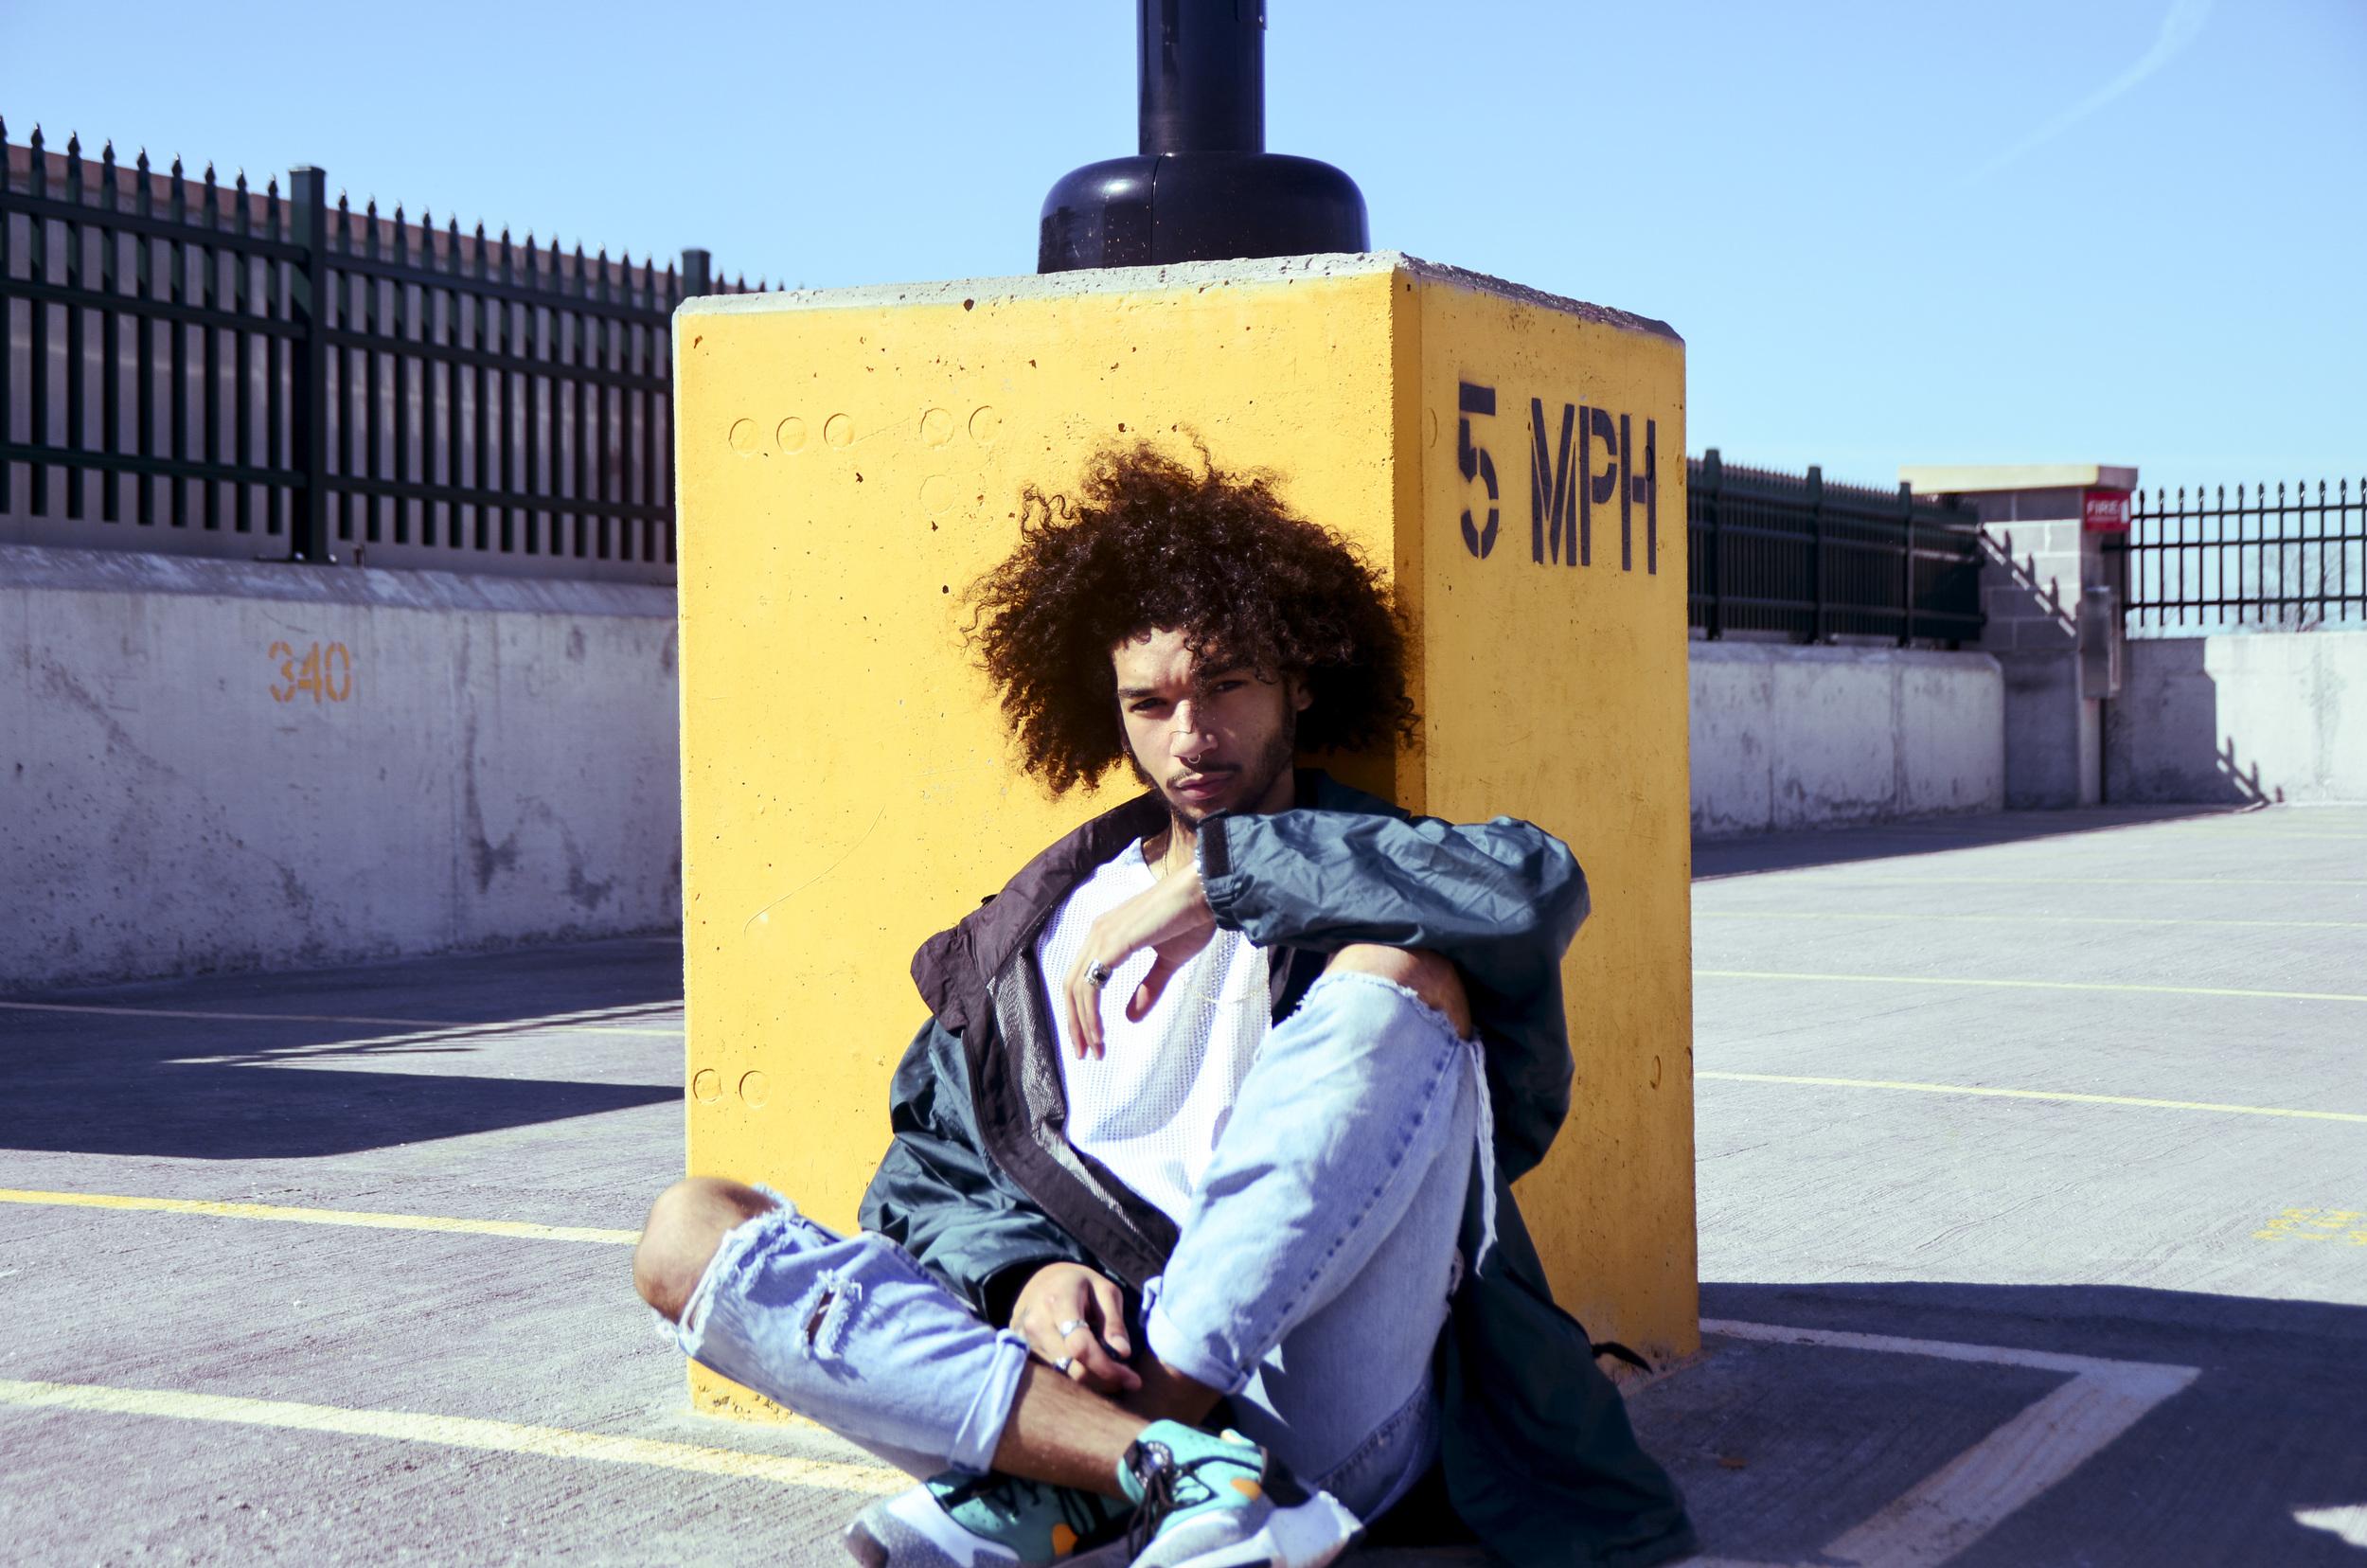 Windbreaker - Thrifted (Volunteers of America) | Mesh T- Shirt - ASOS ( asos.com ) | Jeans - Self Distressed Levis | Shoes - Nike Air Huarache Utility Premiums - ( nike.com )